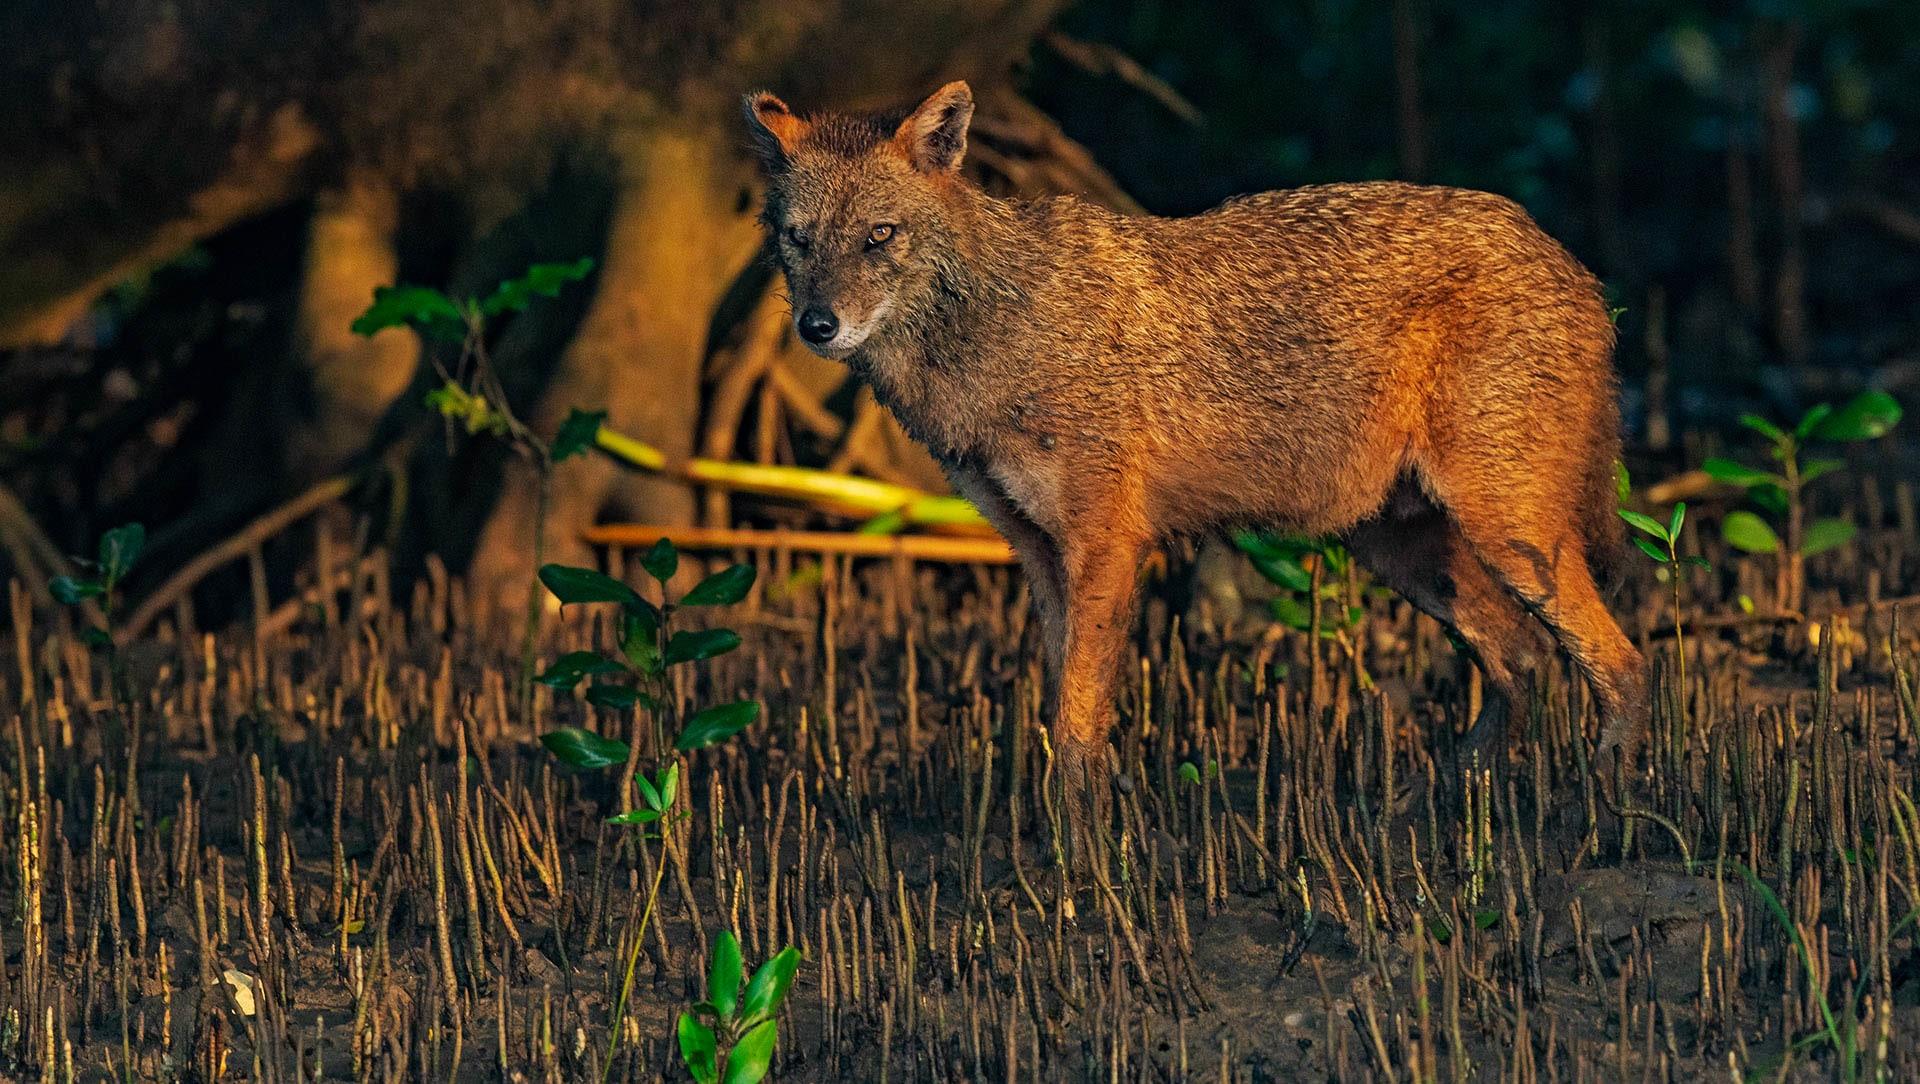 Mangrove Coast: The Emerald Forests of Coringa Wildlife Sanctuary